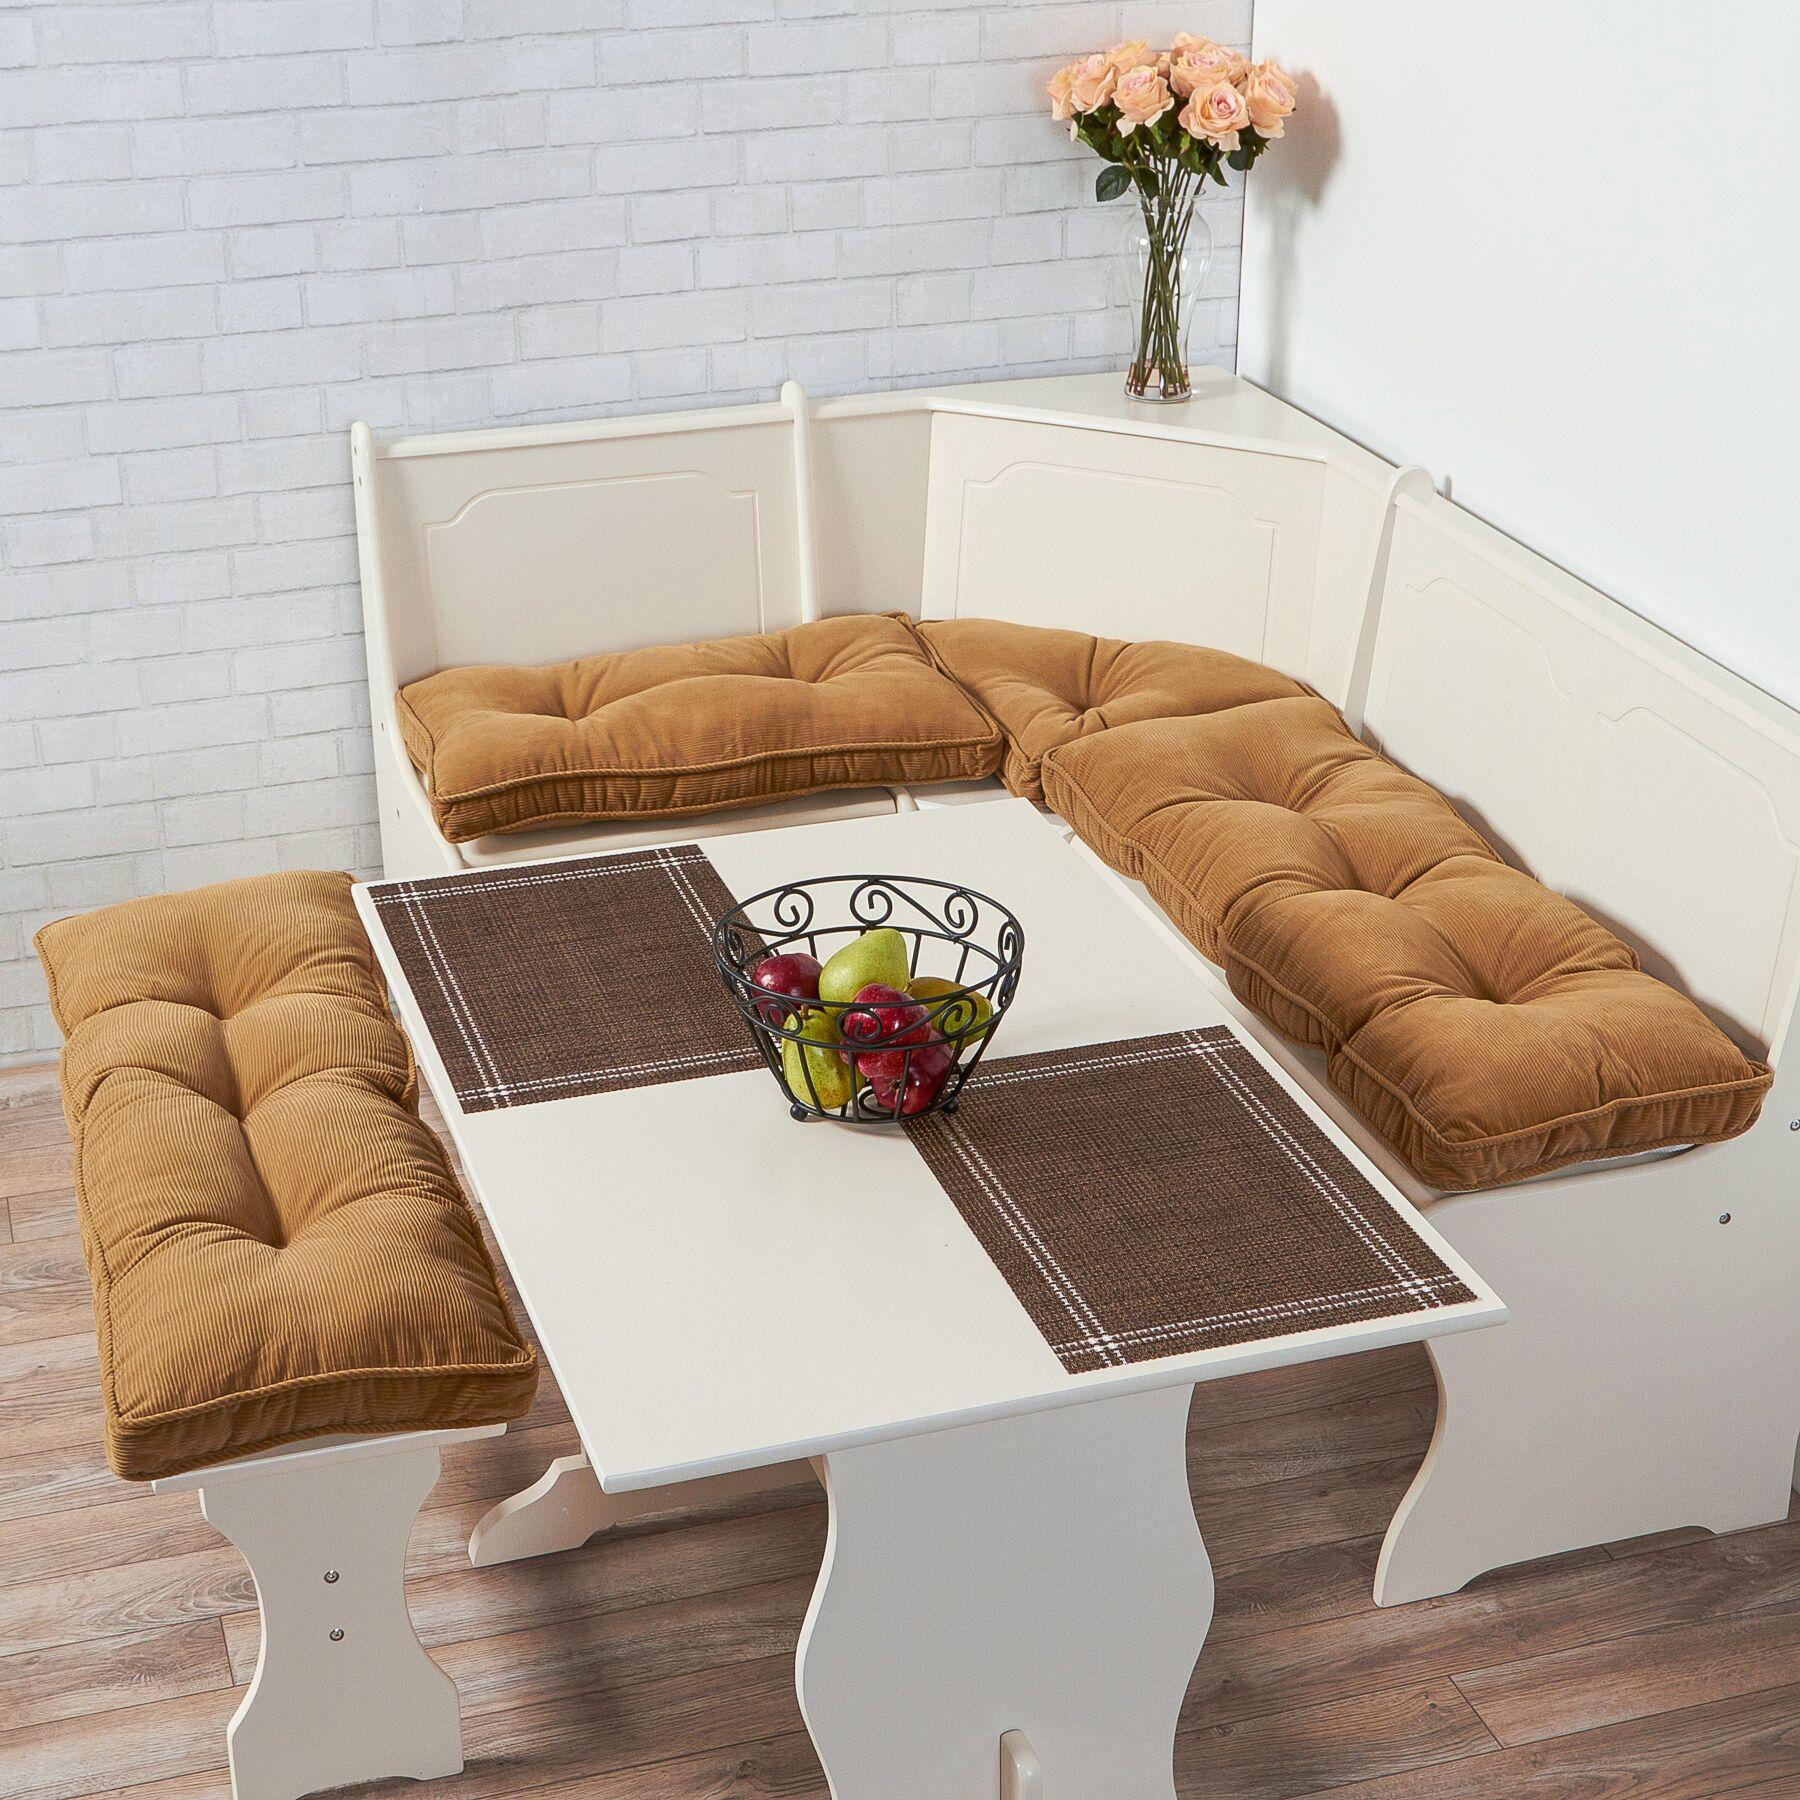 Joie 4 Piece Bench Cushion Set Fabric: Khaki